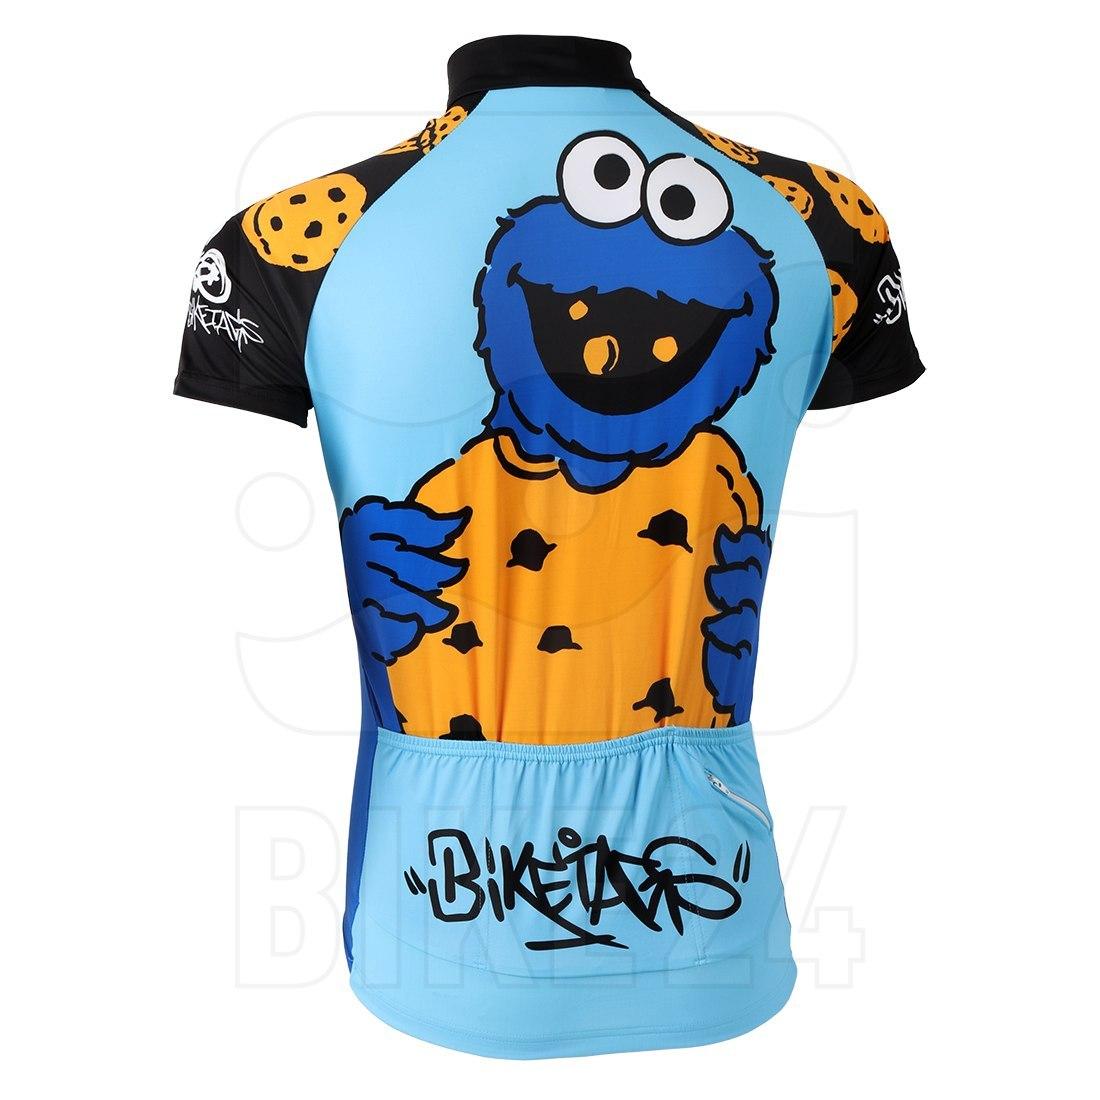 Image of Biketags Jersey Sesame Street - Cookie Monster